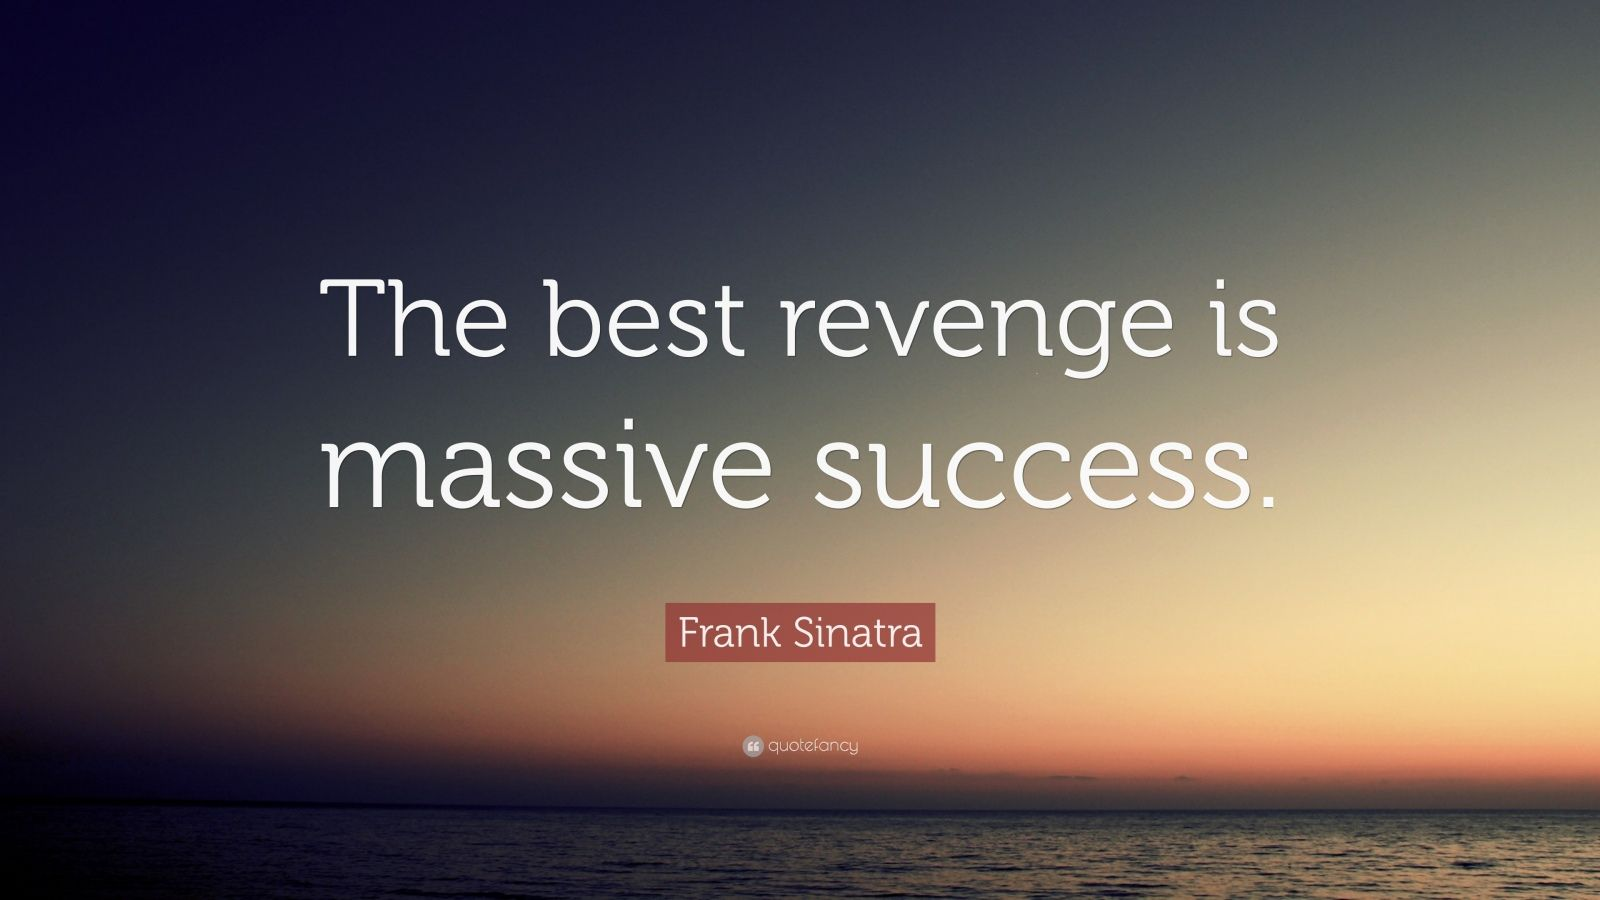 Frank Sinatra Quote The Best Revenge Is Massive Success